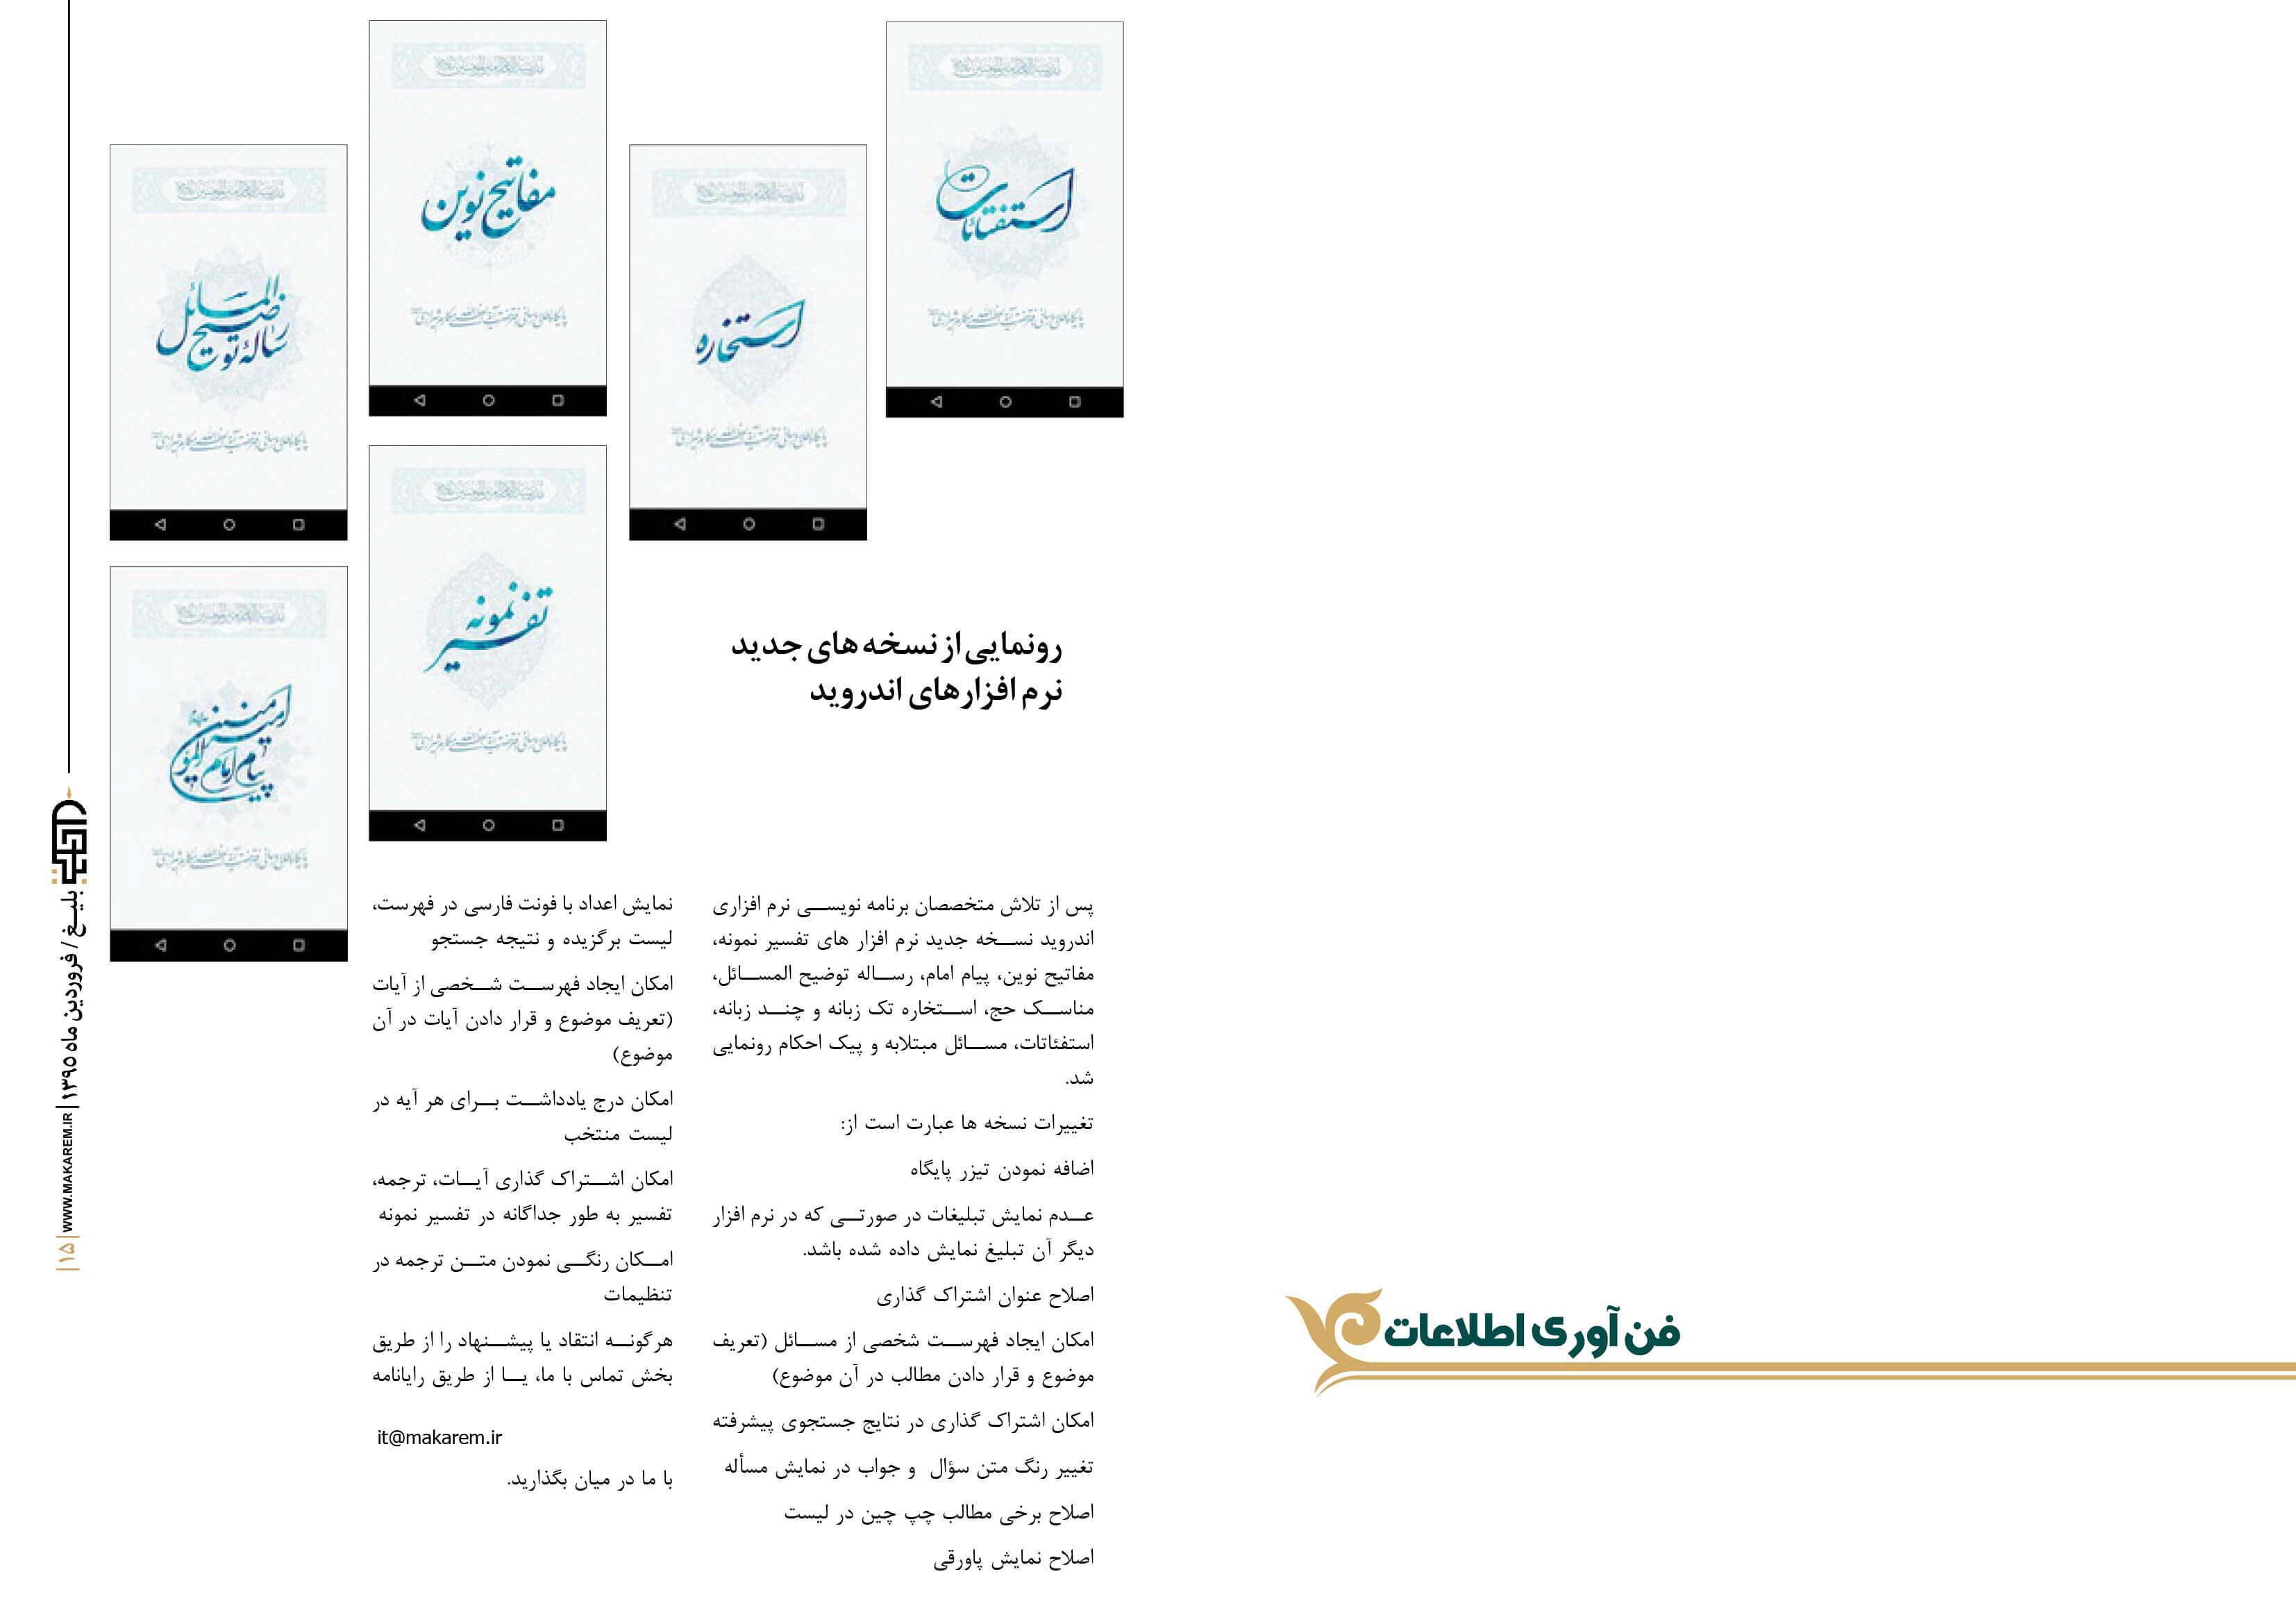 بلیغ 08-مدرسه الامام امیر المومنین (ع)